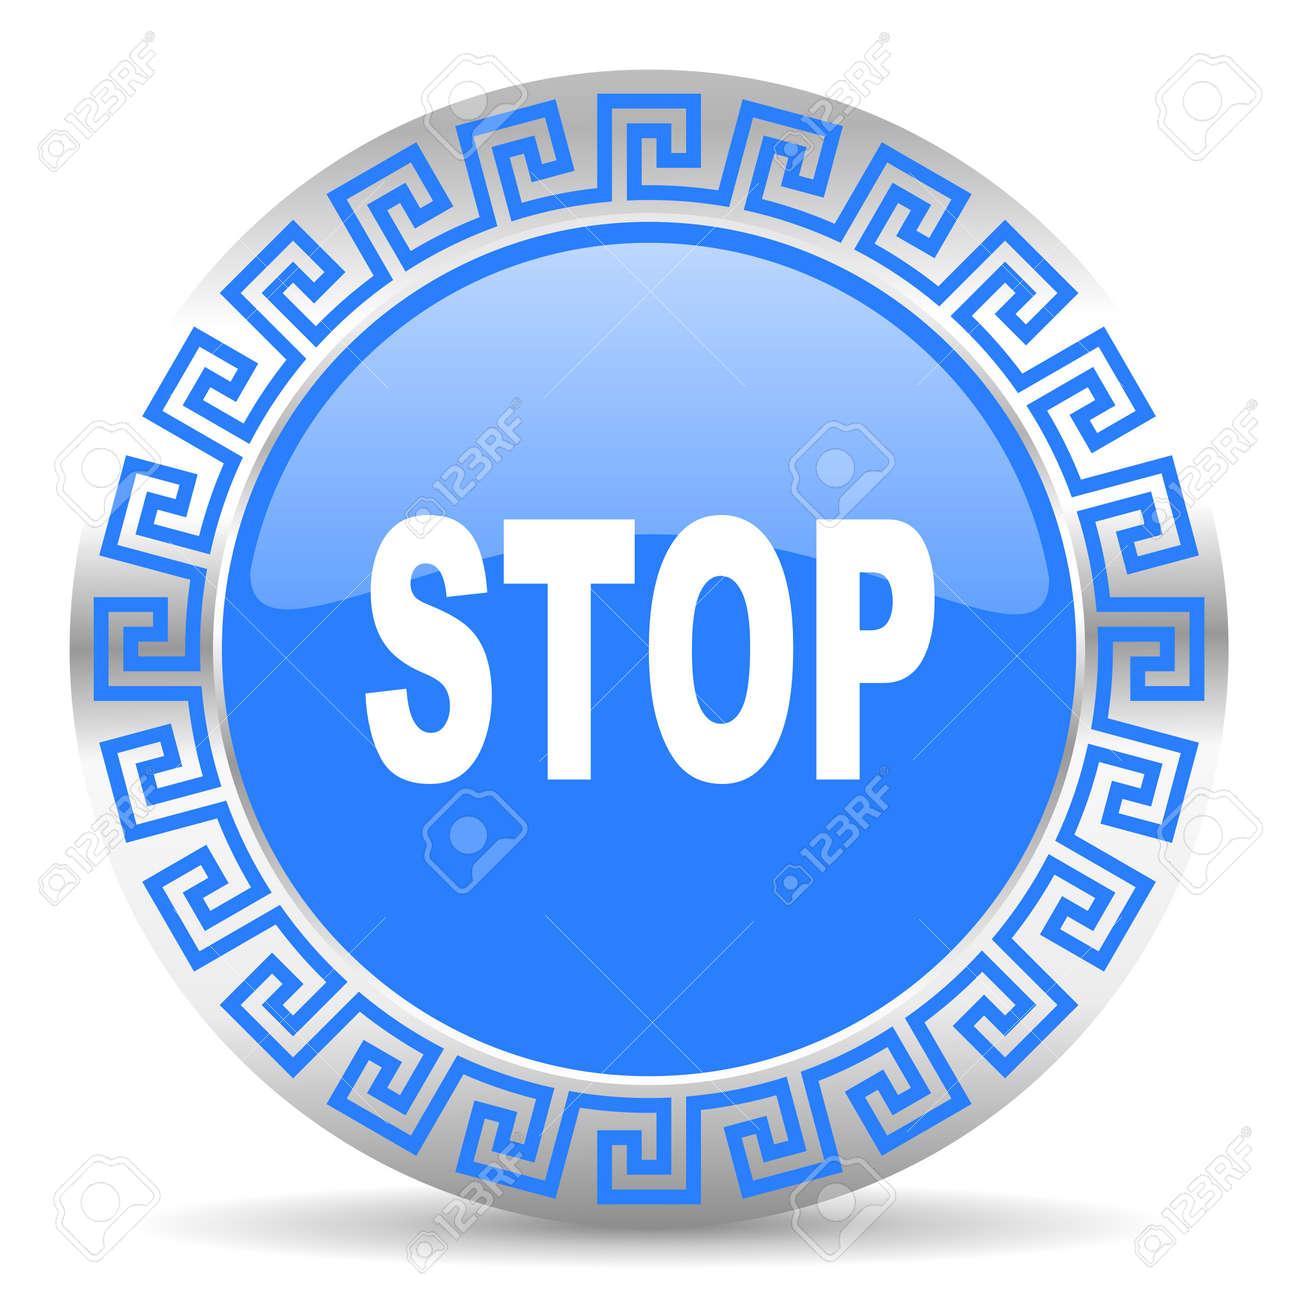 blue circle web button Stock Photo - 26024757